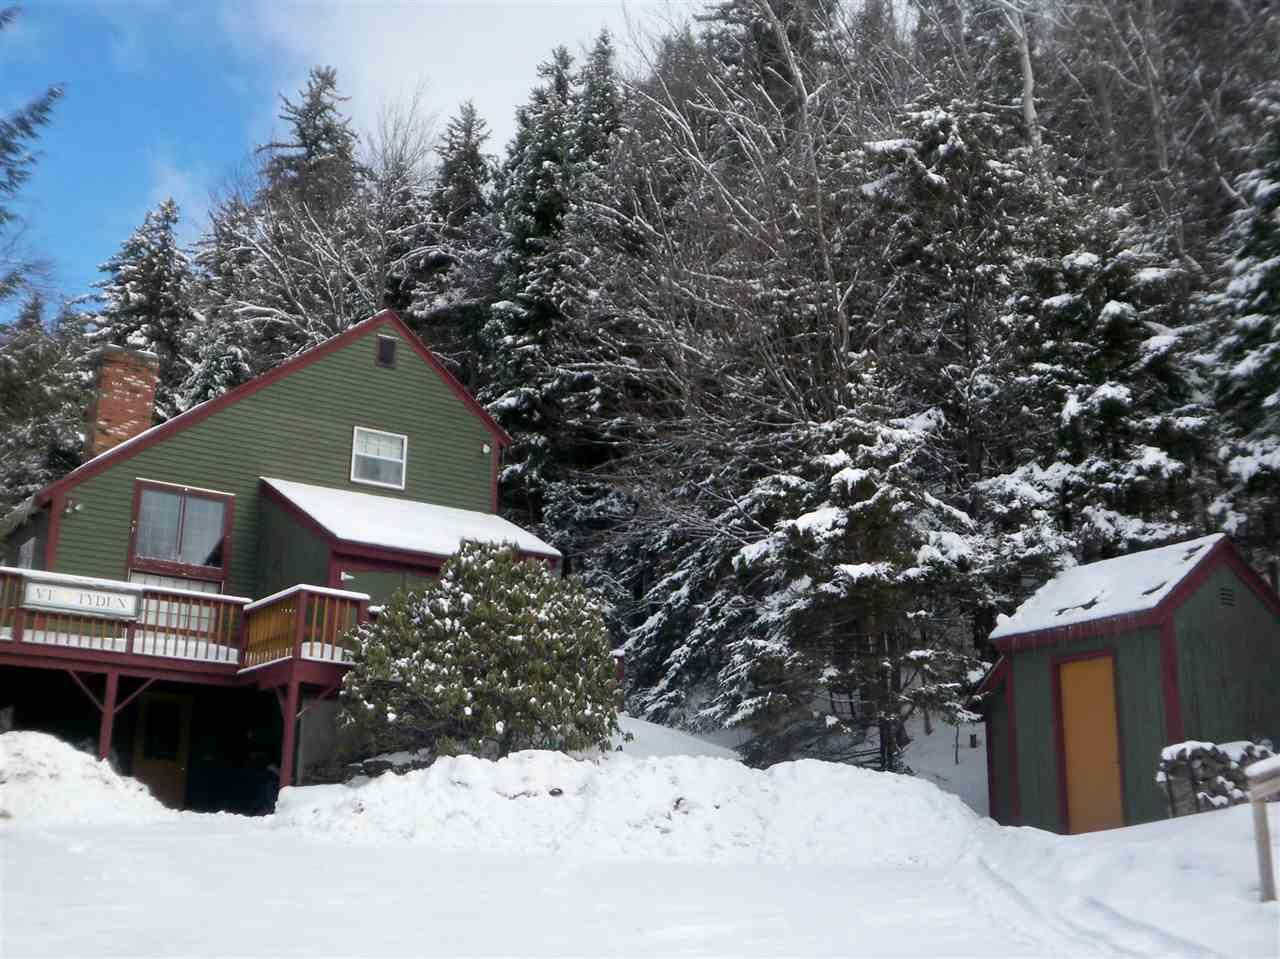 Mount-Snow-Real-Estate-4623747-19